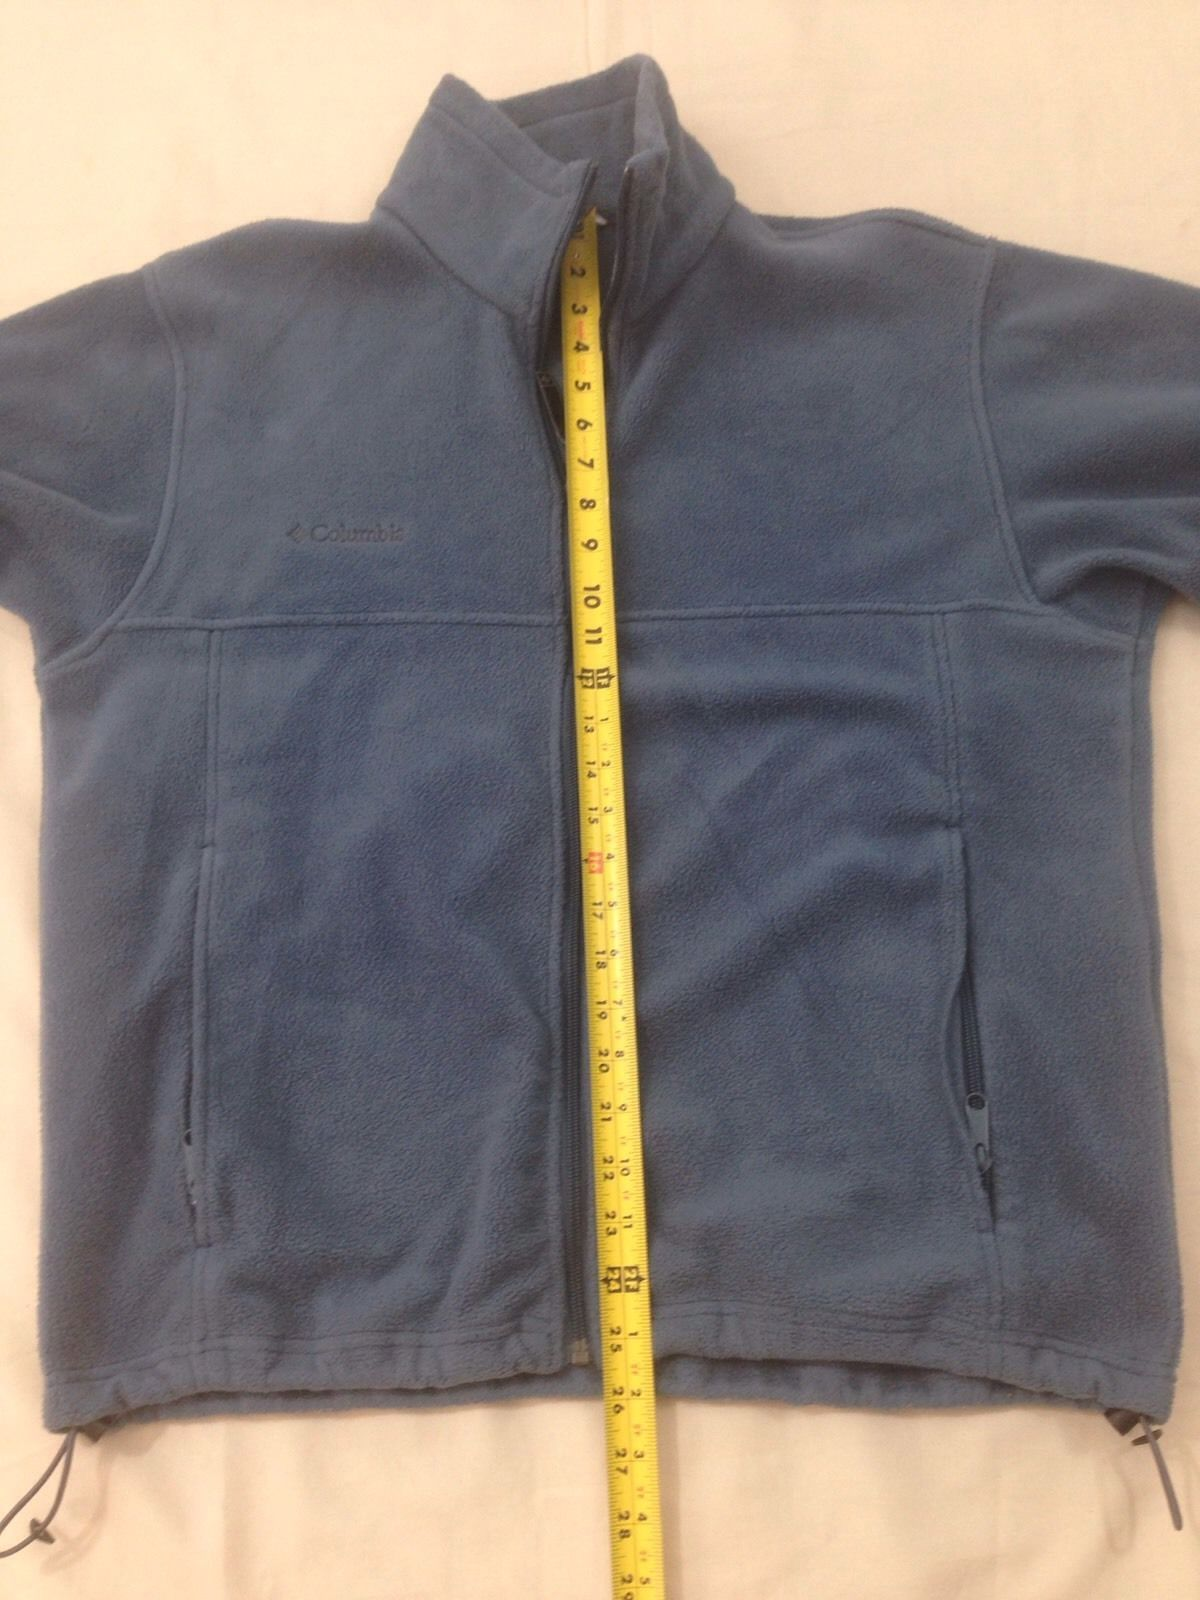 Columbia Mens M Dusty Blue Hiking Camp Lightweight Zip Front Fleece Jacket image 7